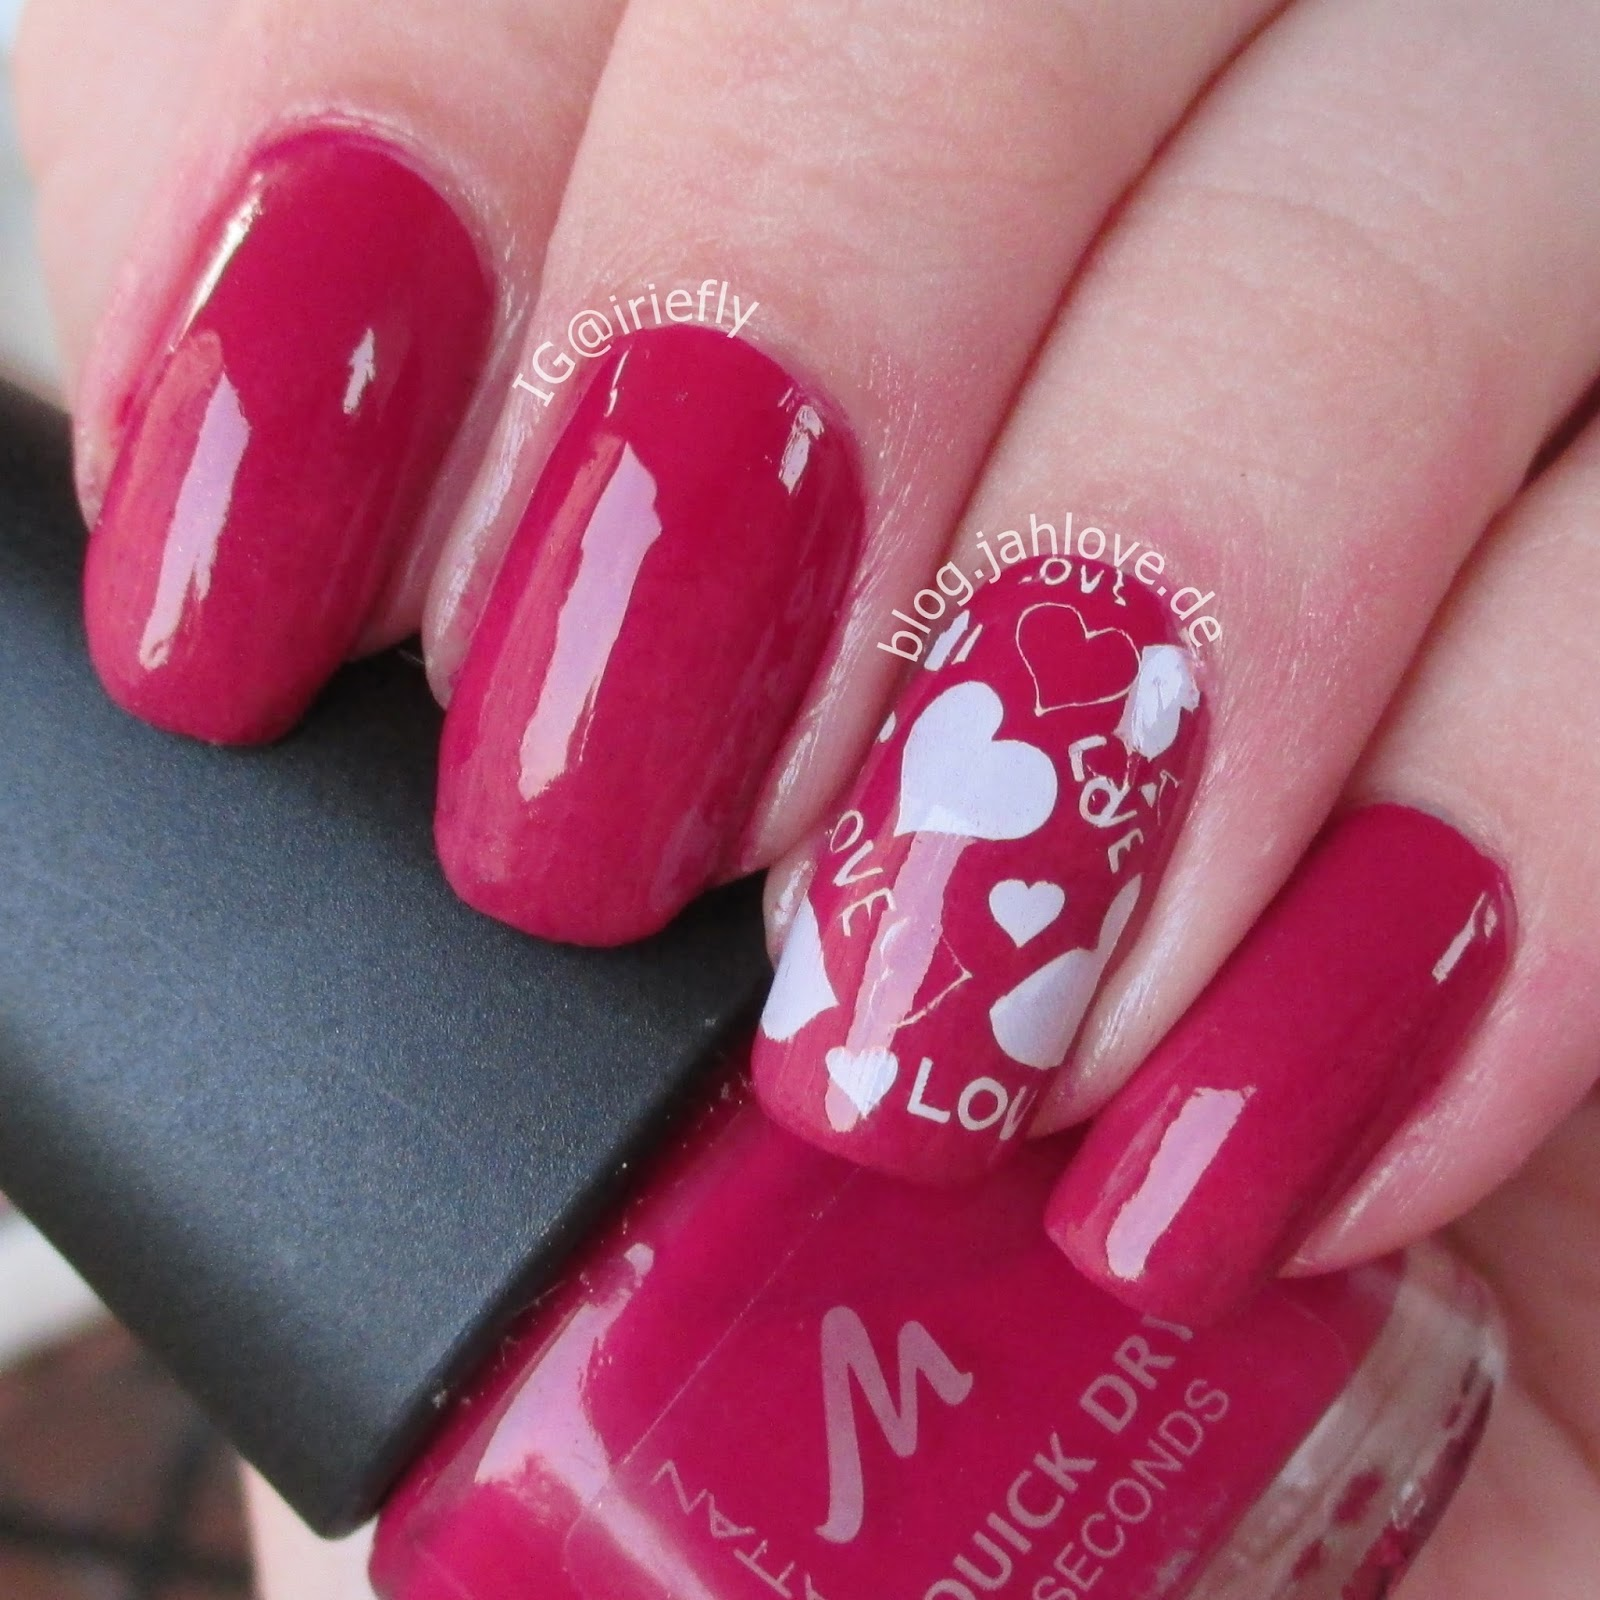 blog.jahlove.de ::.: [Nails] Manhattan Quick Dry \